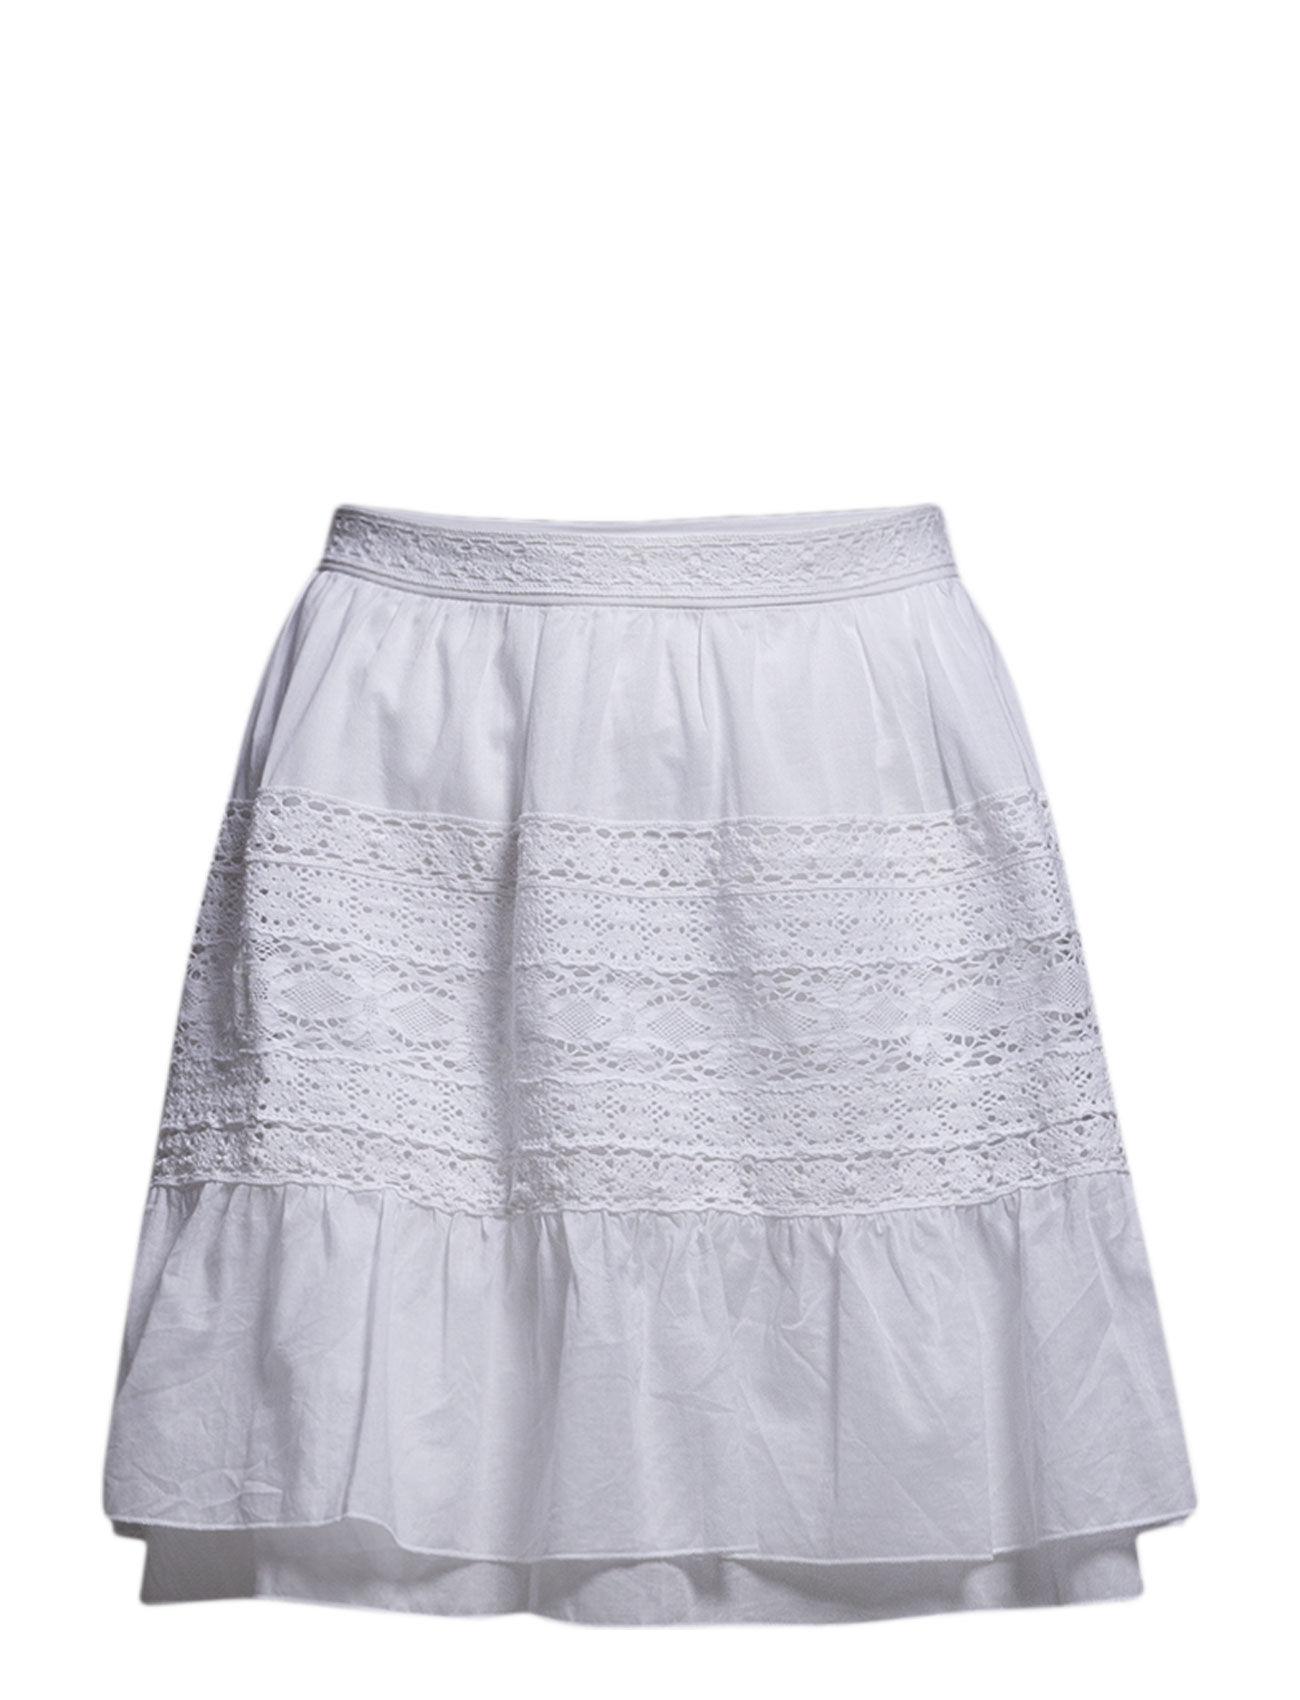 Harriet Skirt